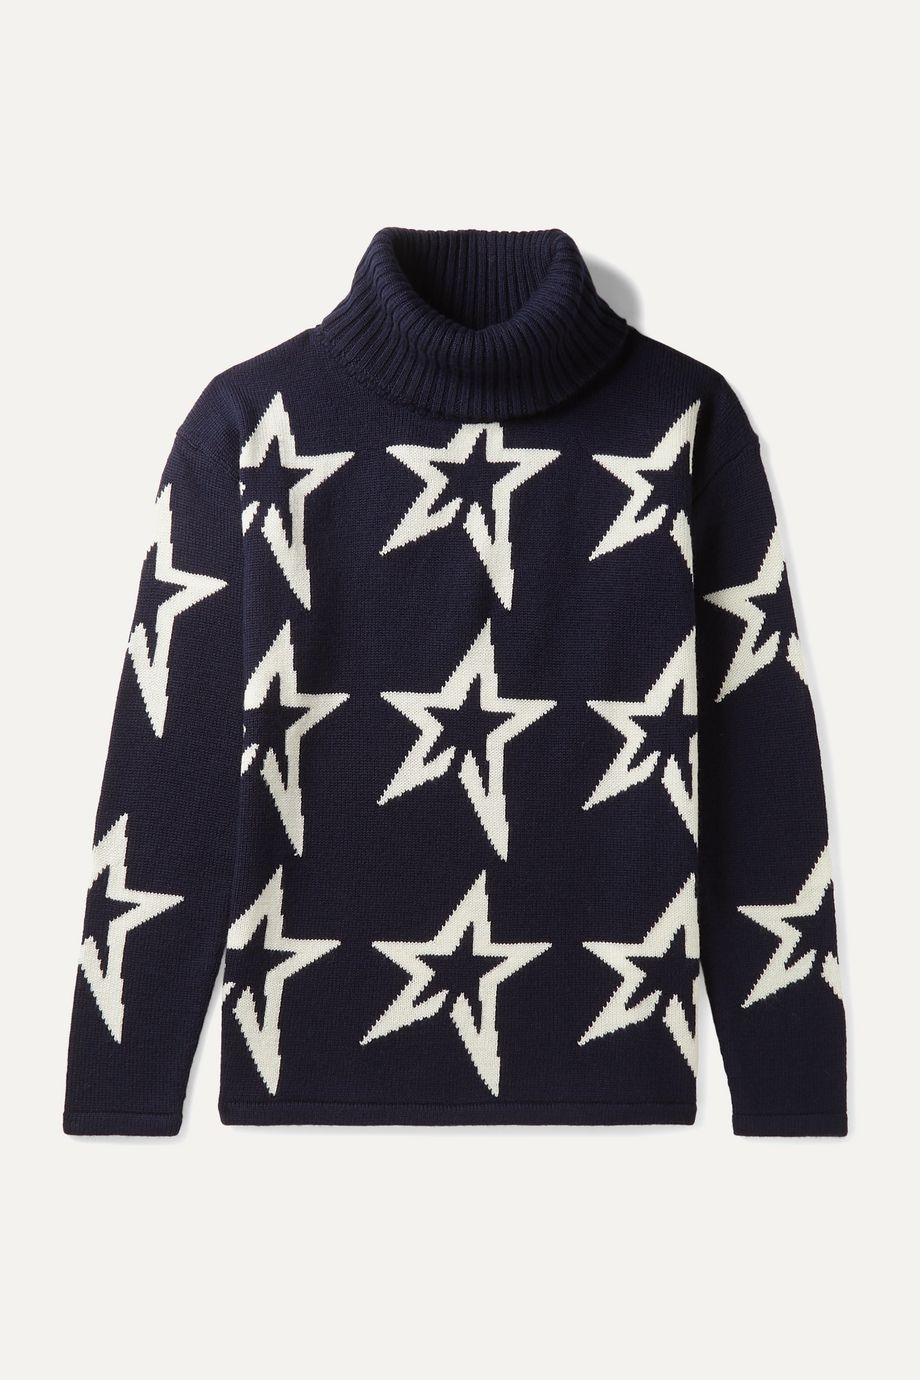 Perfect Moment Kids Ages 6 - 12 Star Dust intarsia merino wool turtleneck sweater